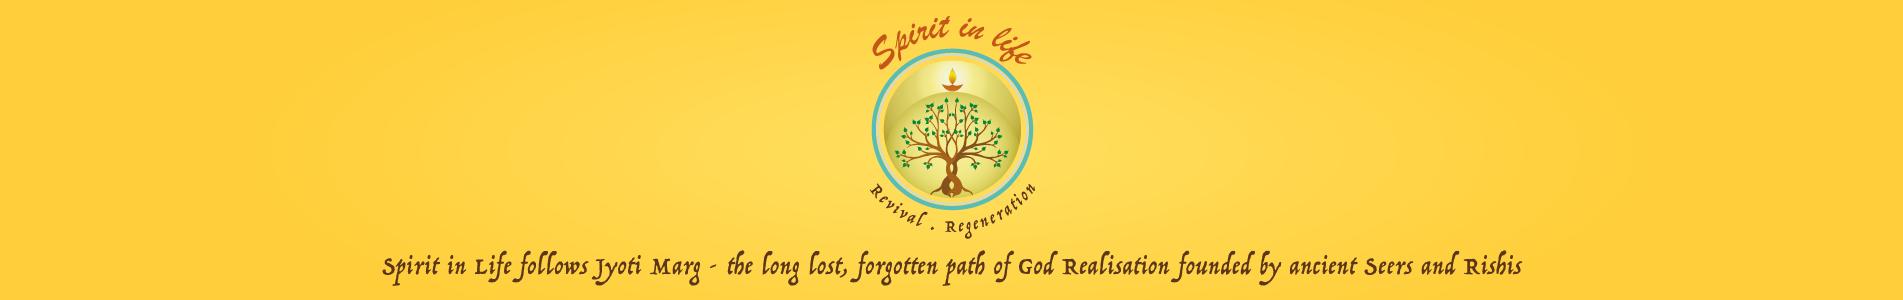 Spirit in life